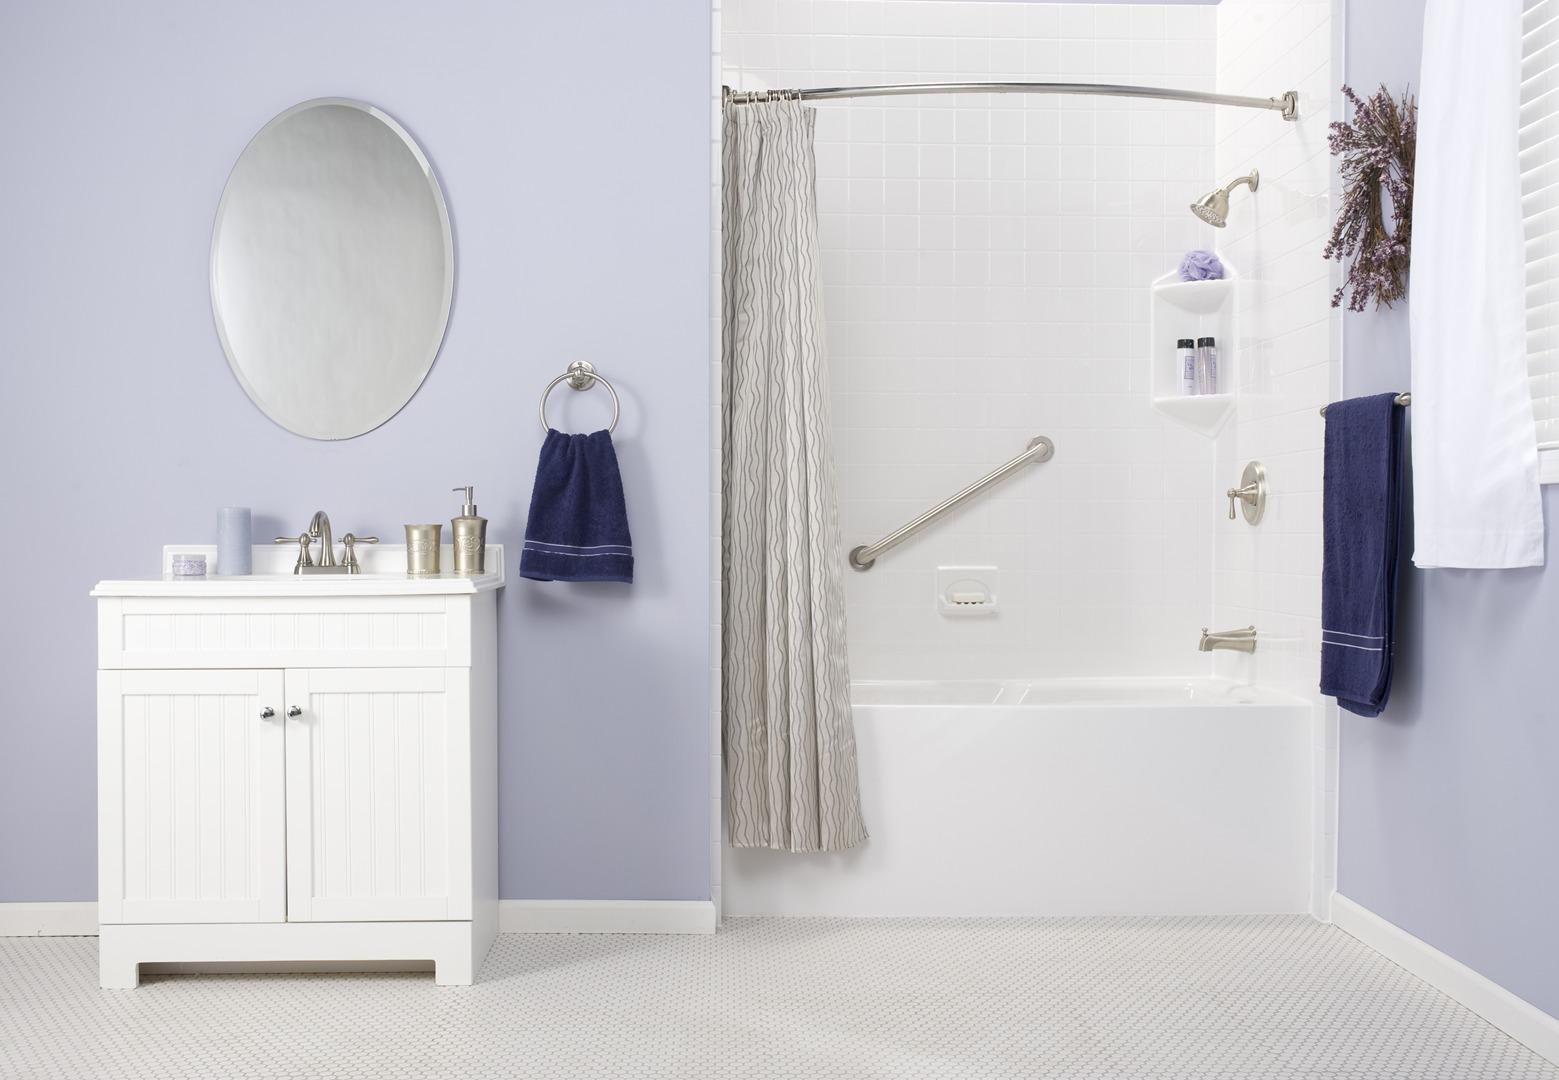 Bathtub and Shower Repair Remodel Affordable